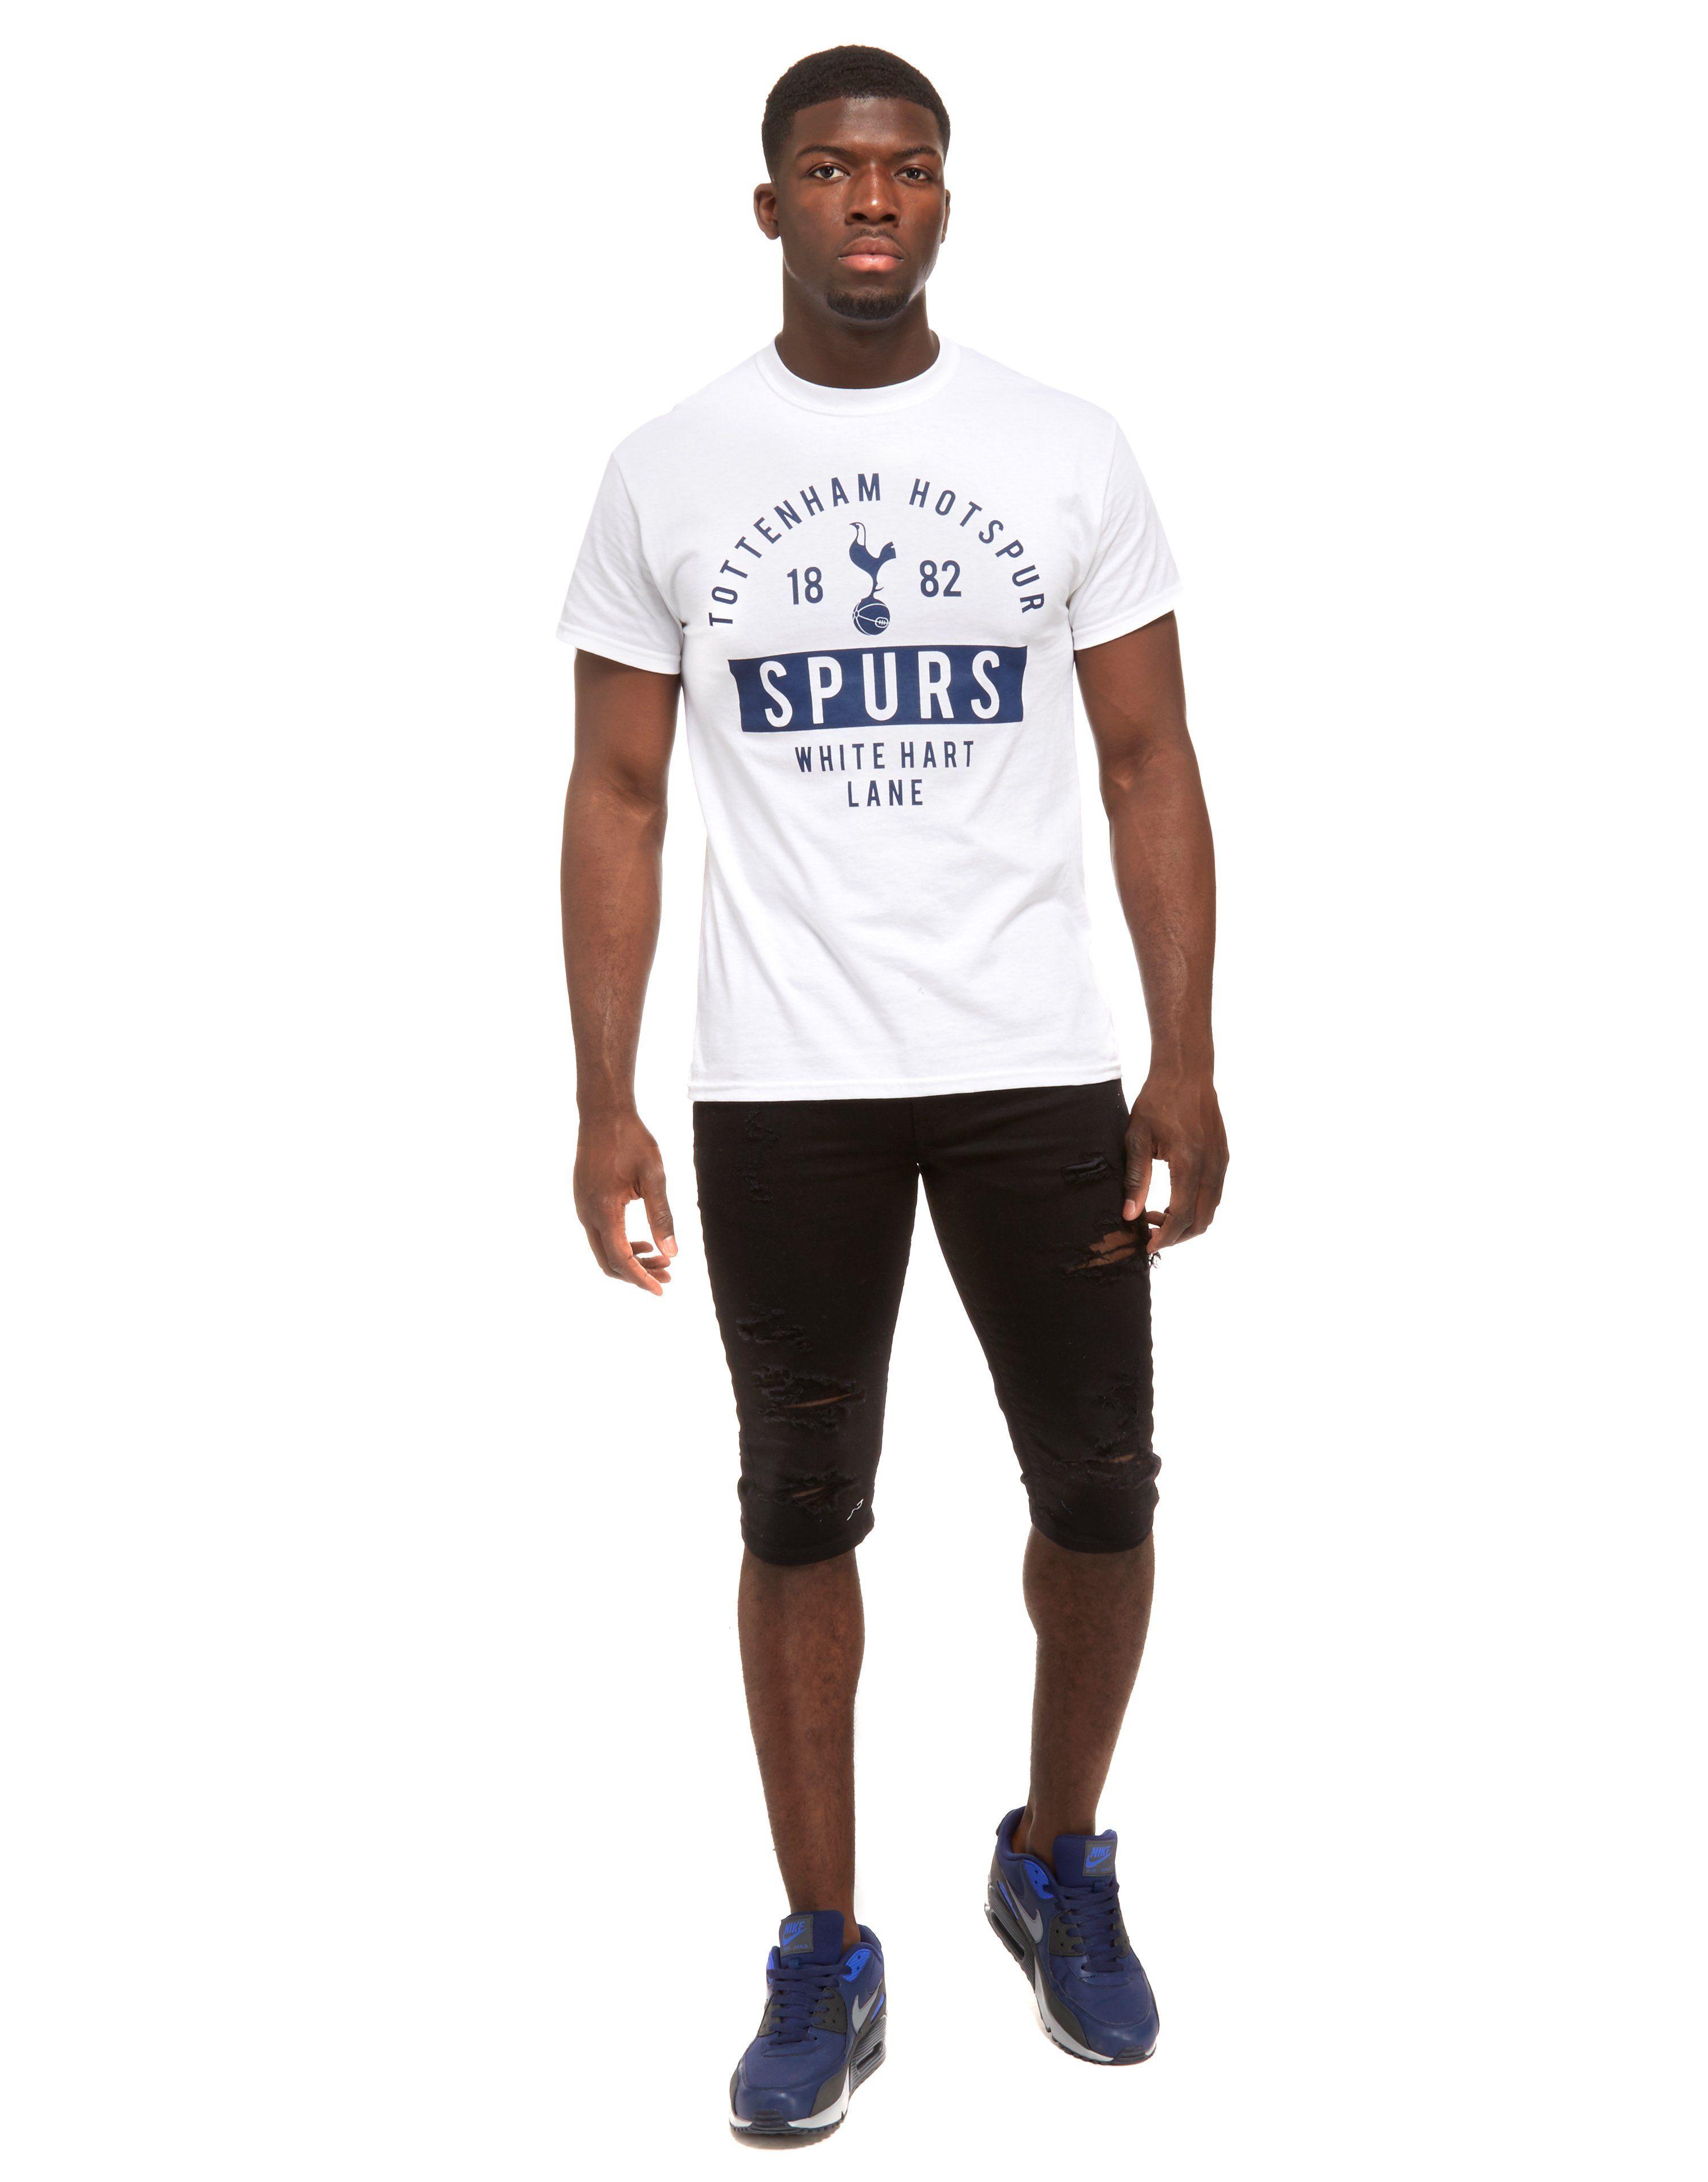 Official Team Tottenham Hotspur 2017 White Hart Lane T-Shirt